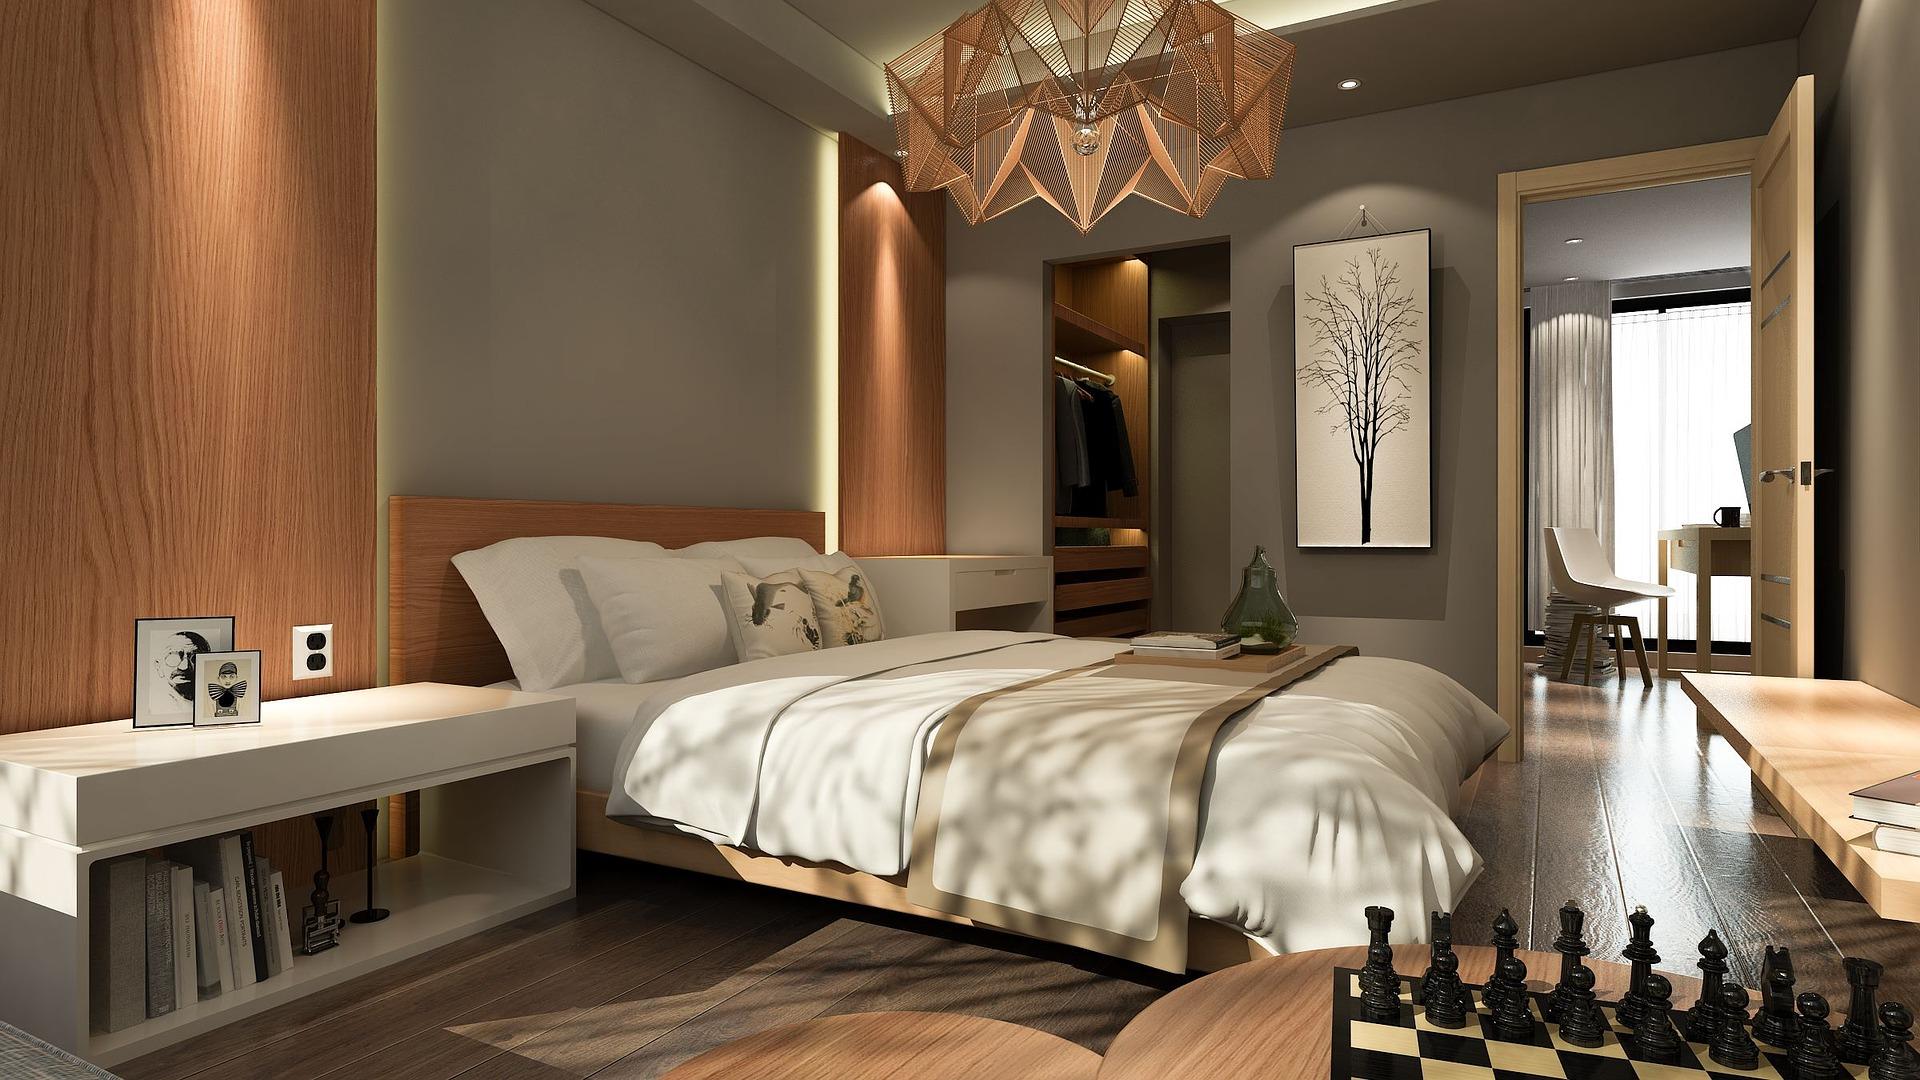 bedroom-1807837_1920.jpg